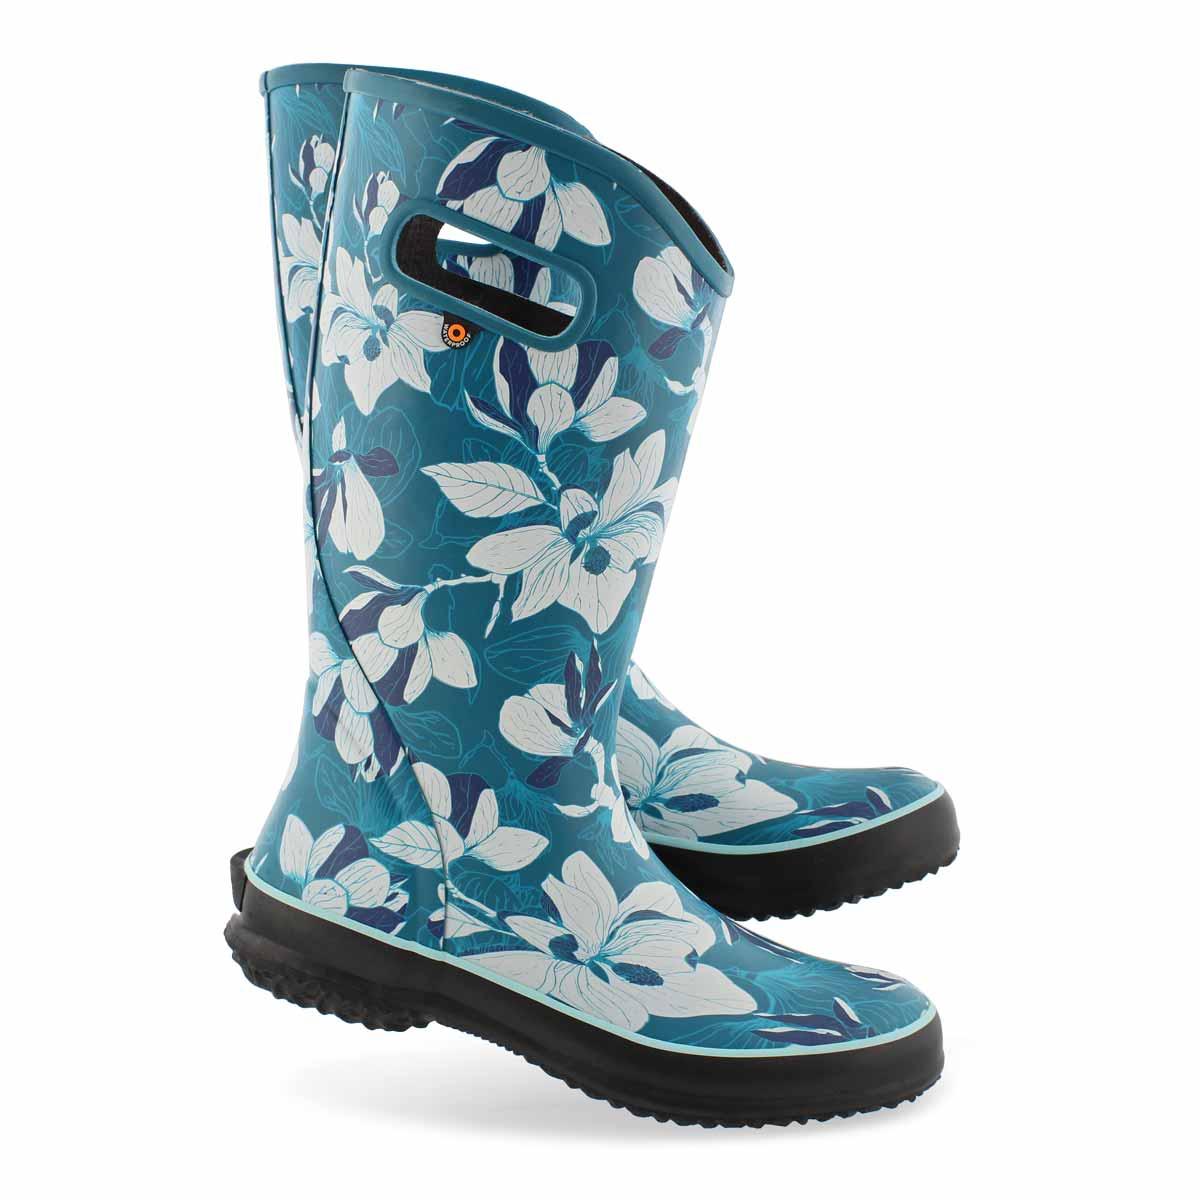 Lds Spring Vintage aqua multi rain boot